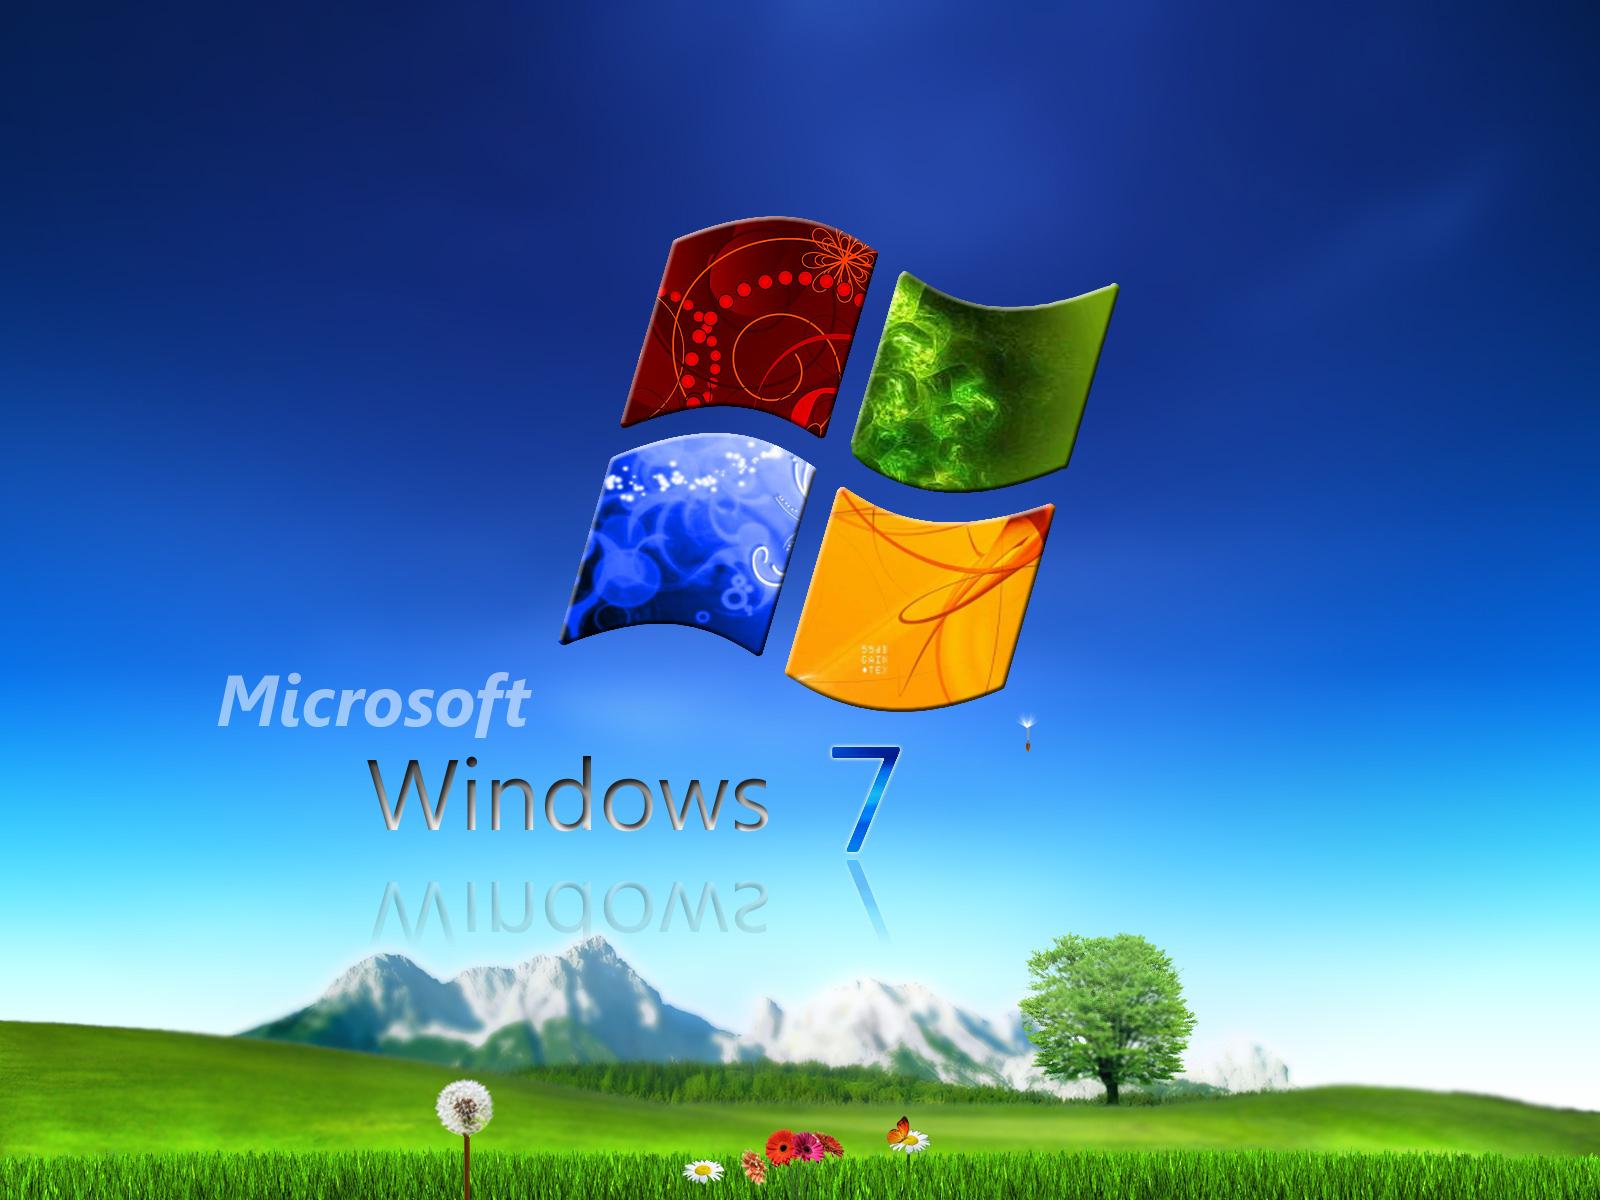 HD Wallpaper of Windows 7 HD Wallpapers 1600x1200